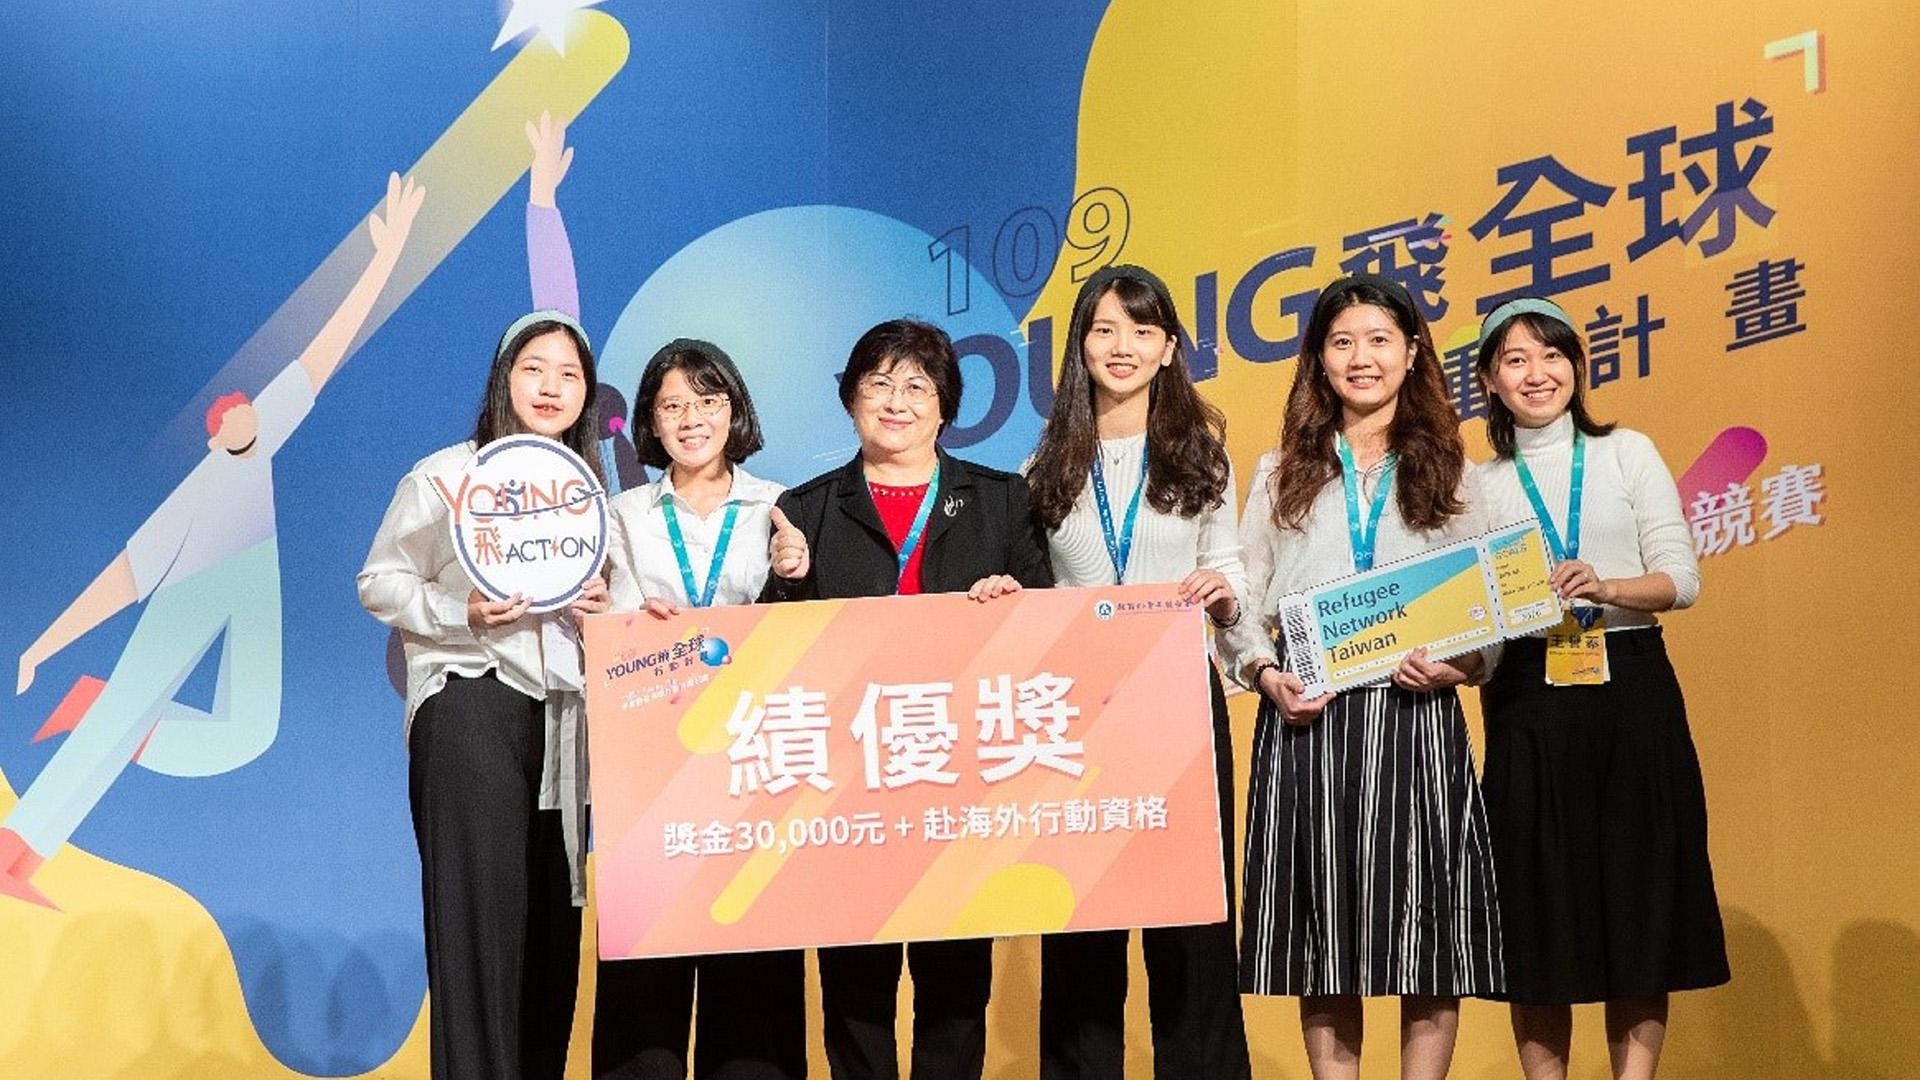 「Refugee Network Taiwan」團隊獲選109年Young飛全球行動計畫績優團隊